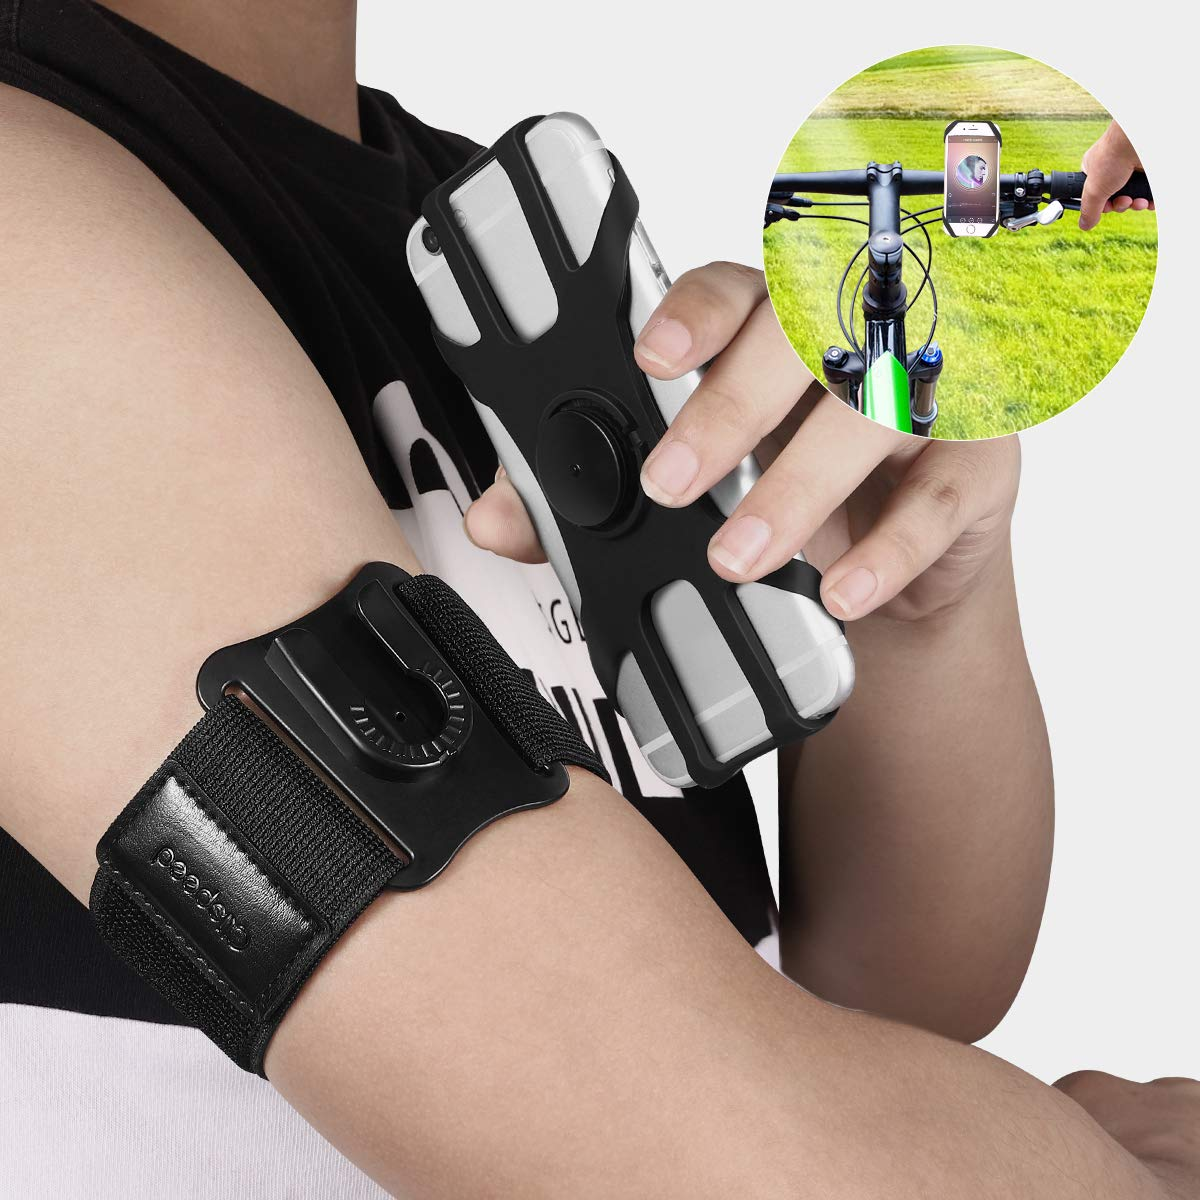 CLISPEED Running Armband Wristband 360° Rotation Bike Phone Mount, 3-IN-1 Phone Holder Set by CLISPEED